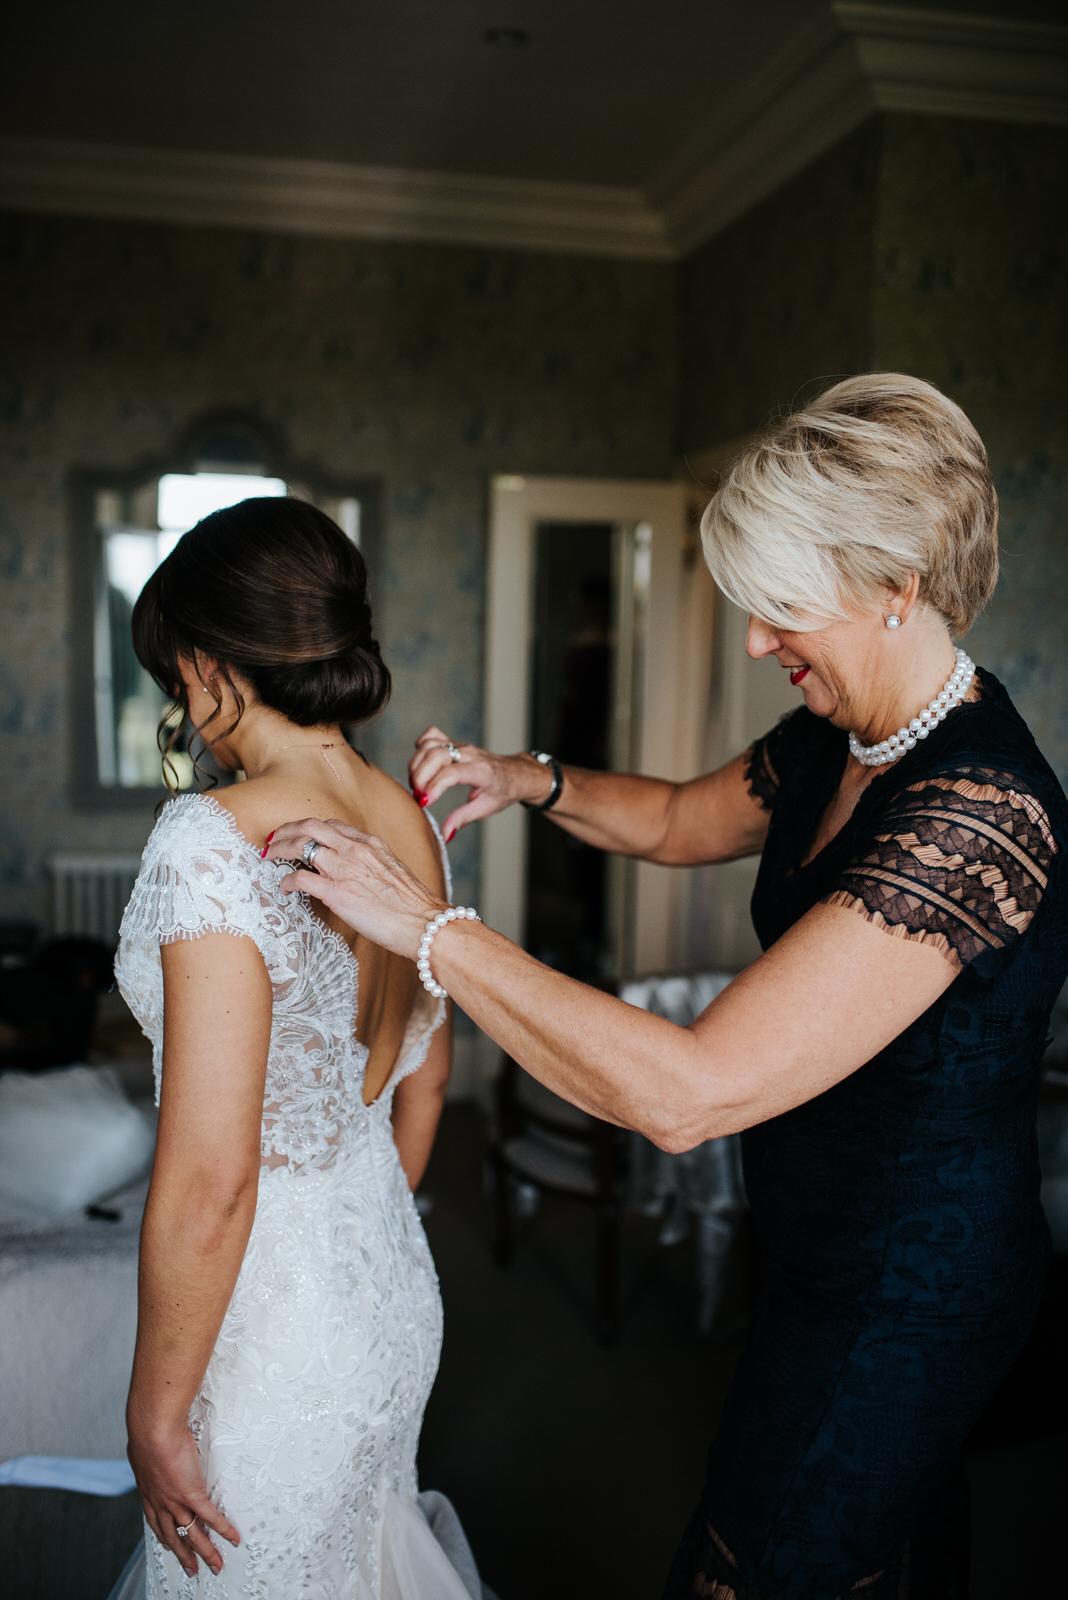 Bride's mom helps bride put on wedding dress